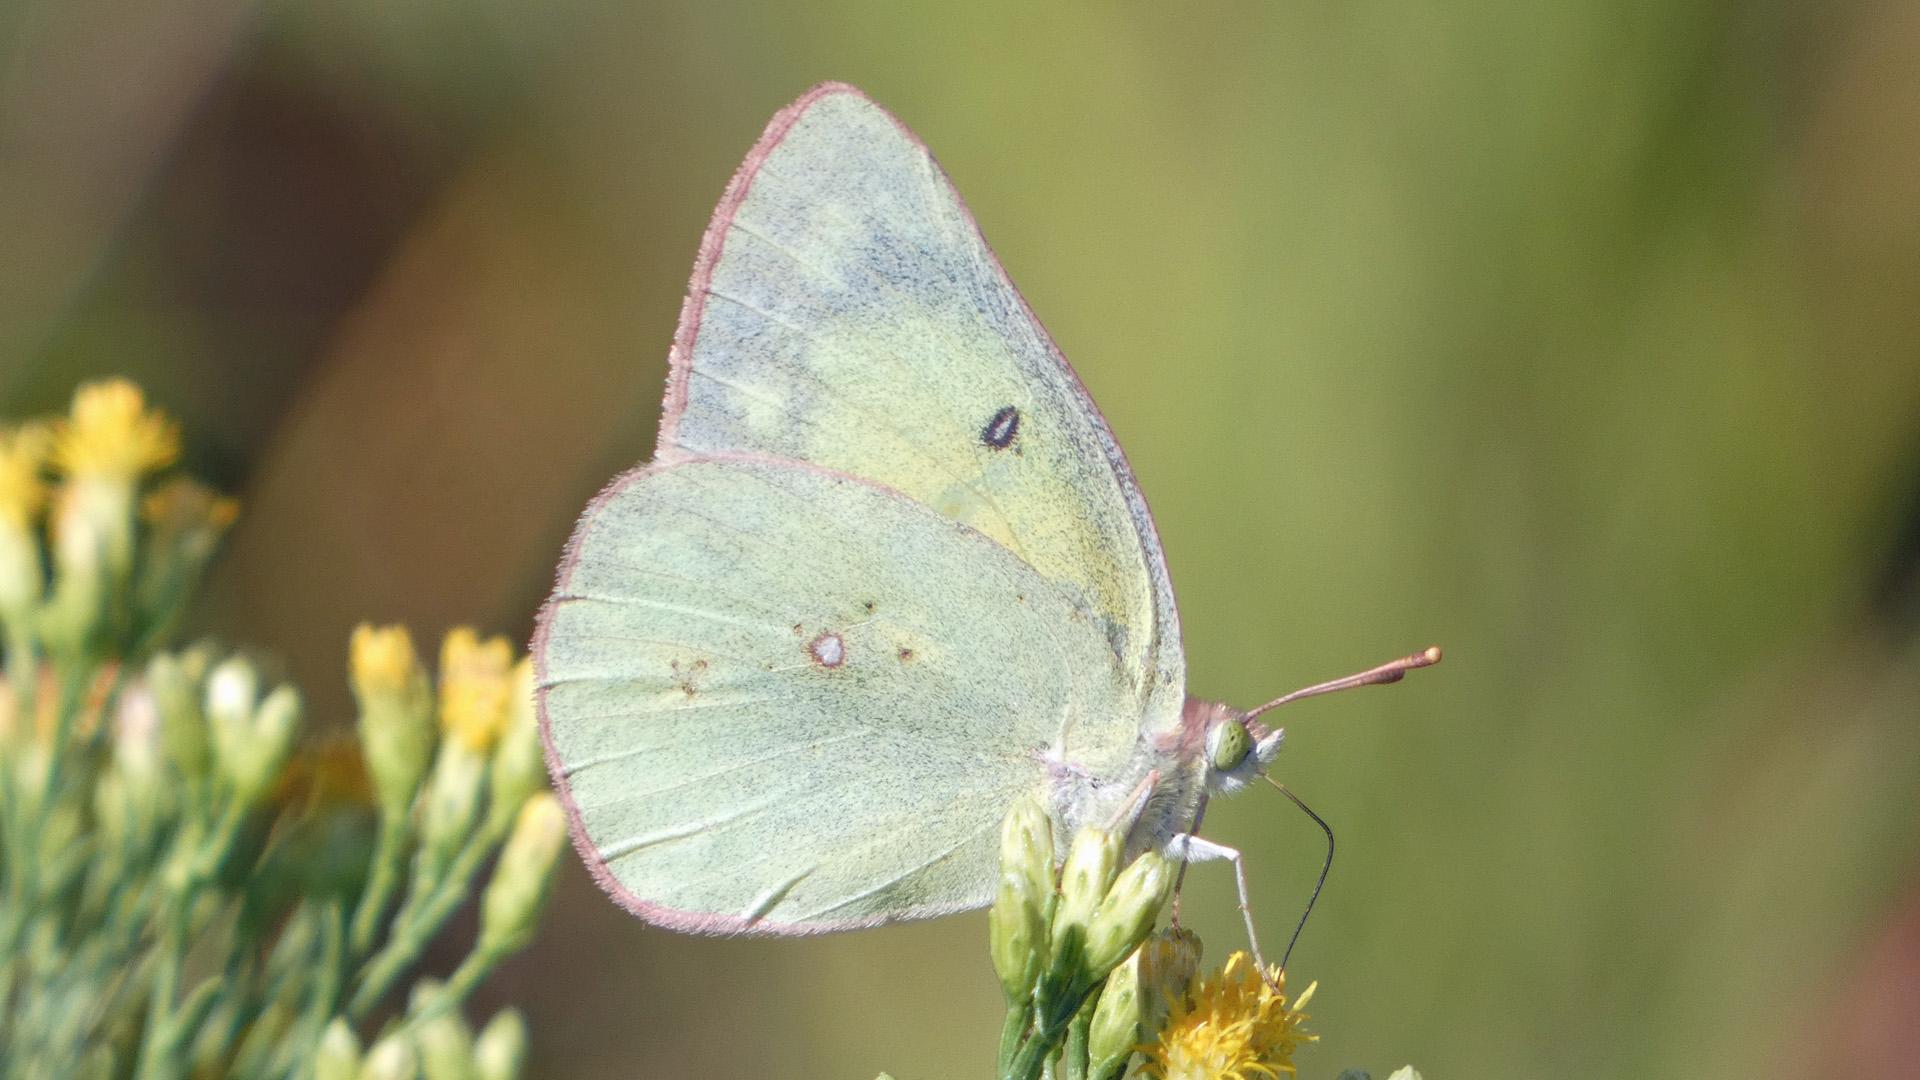 Female, Rio Grande Bosque, September 2021